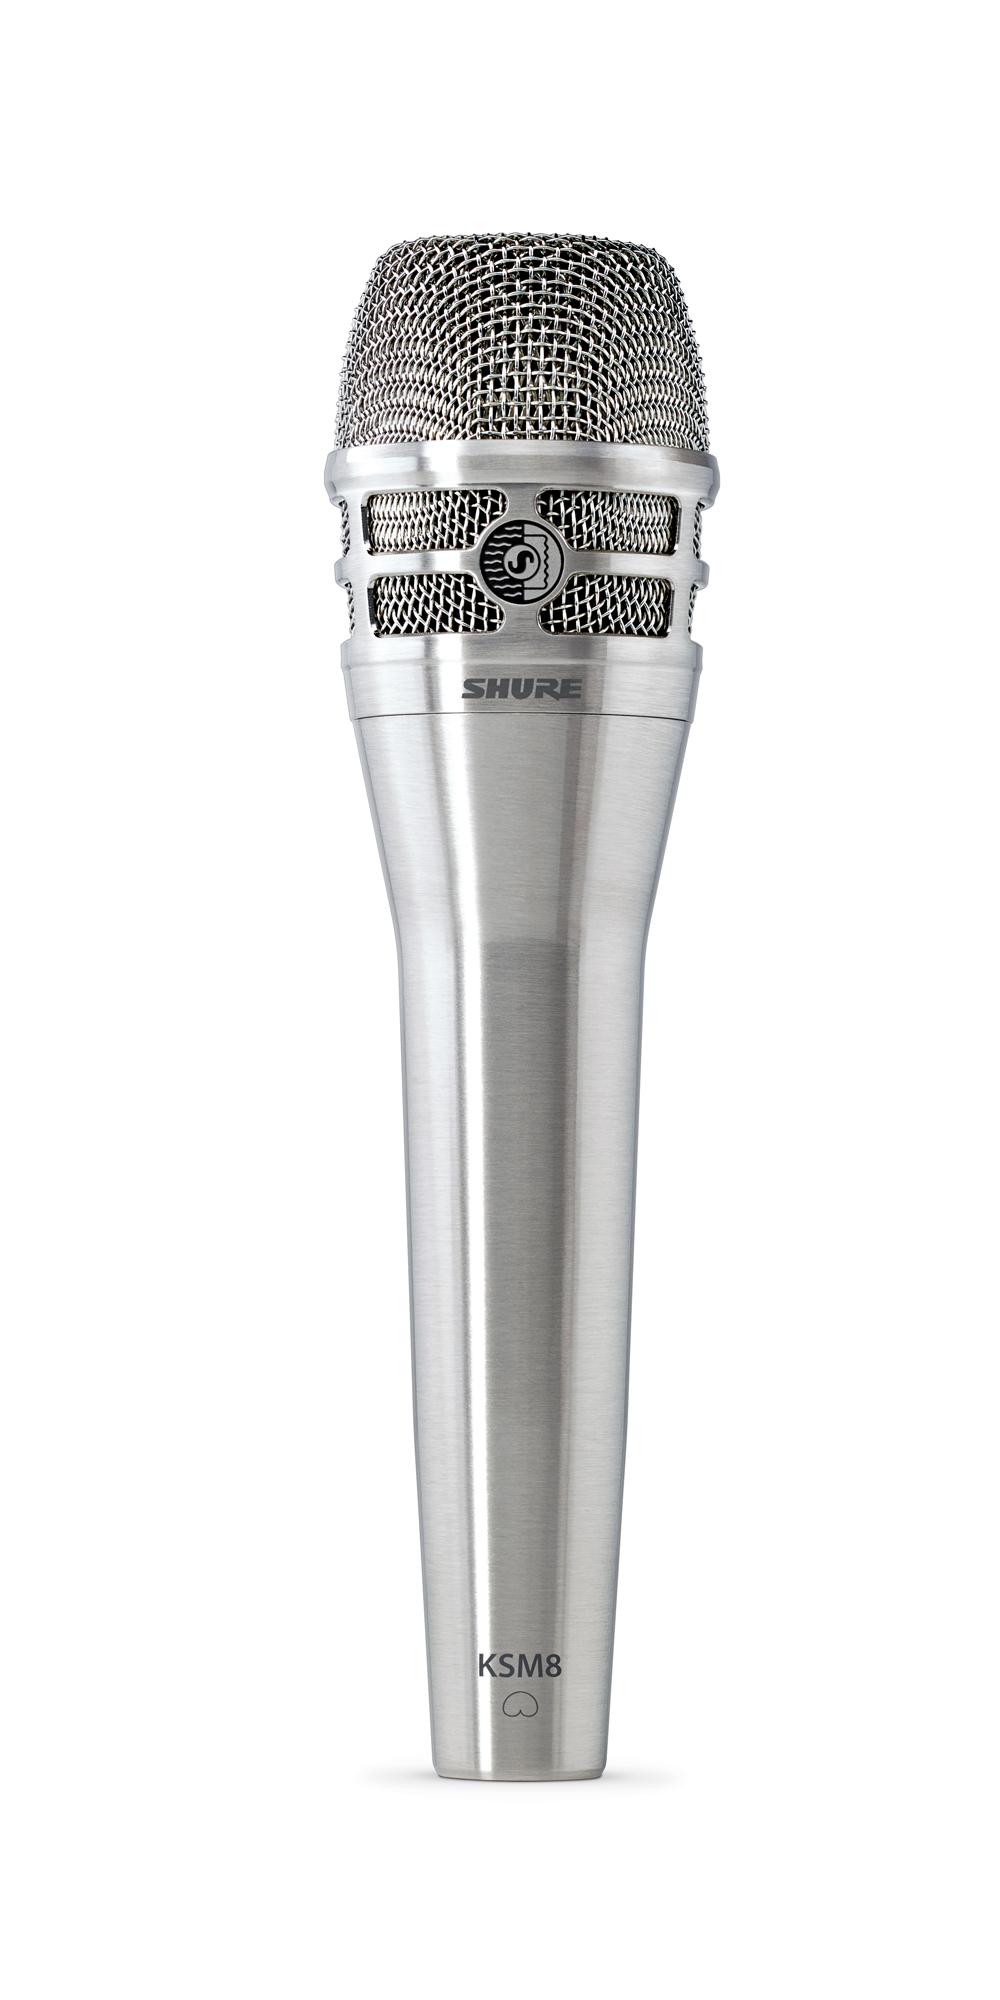 shure ksm8 dualdyne handheld dynamic microphone nickel pro audio superstore. Black Bedroom Furniture Sets. Home Design Ideas